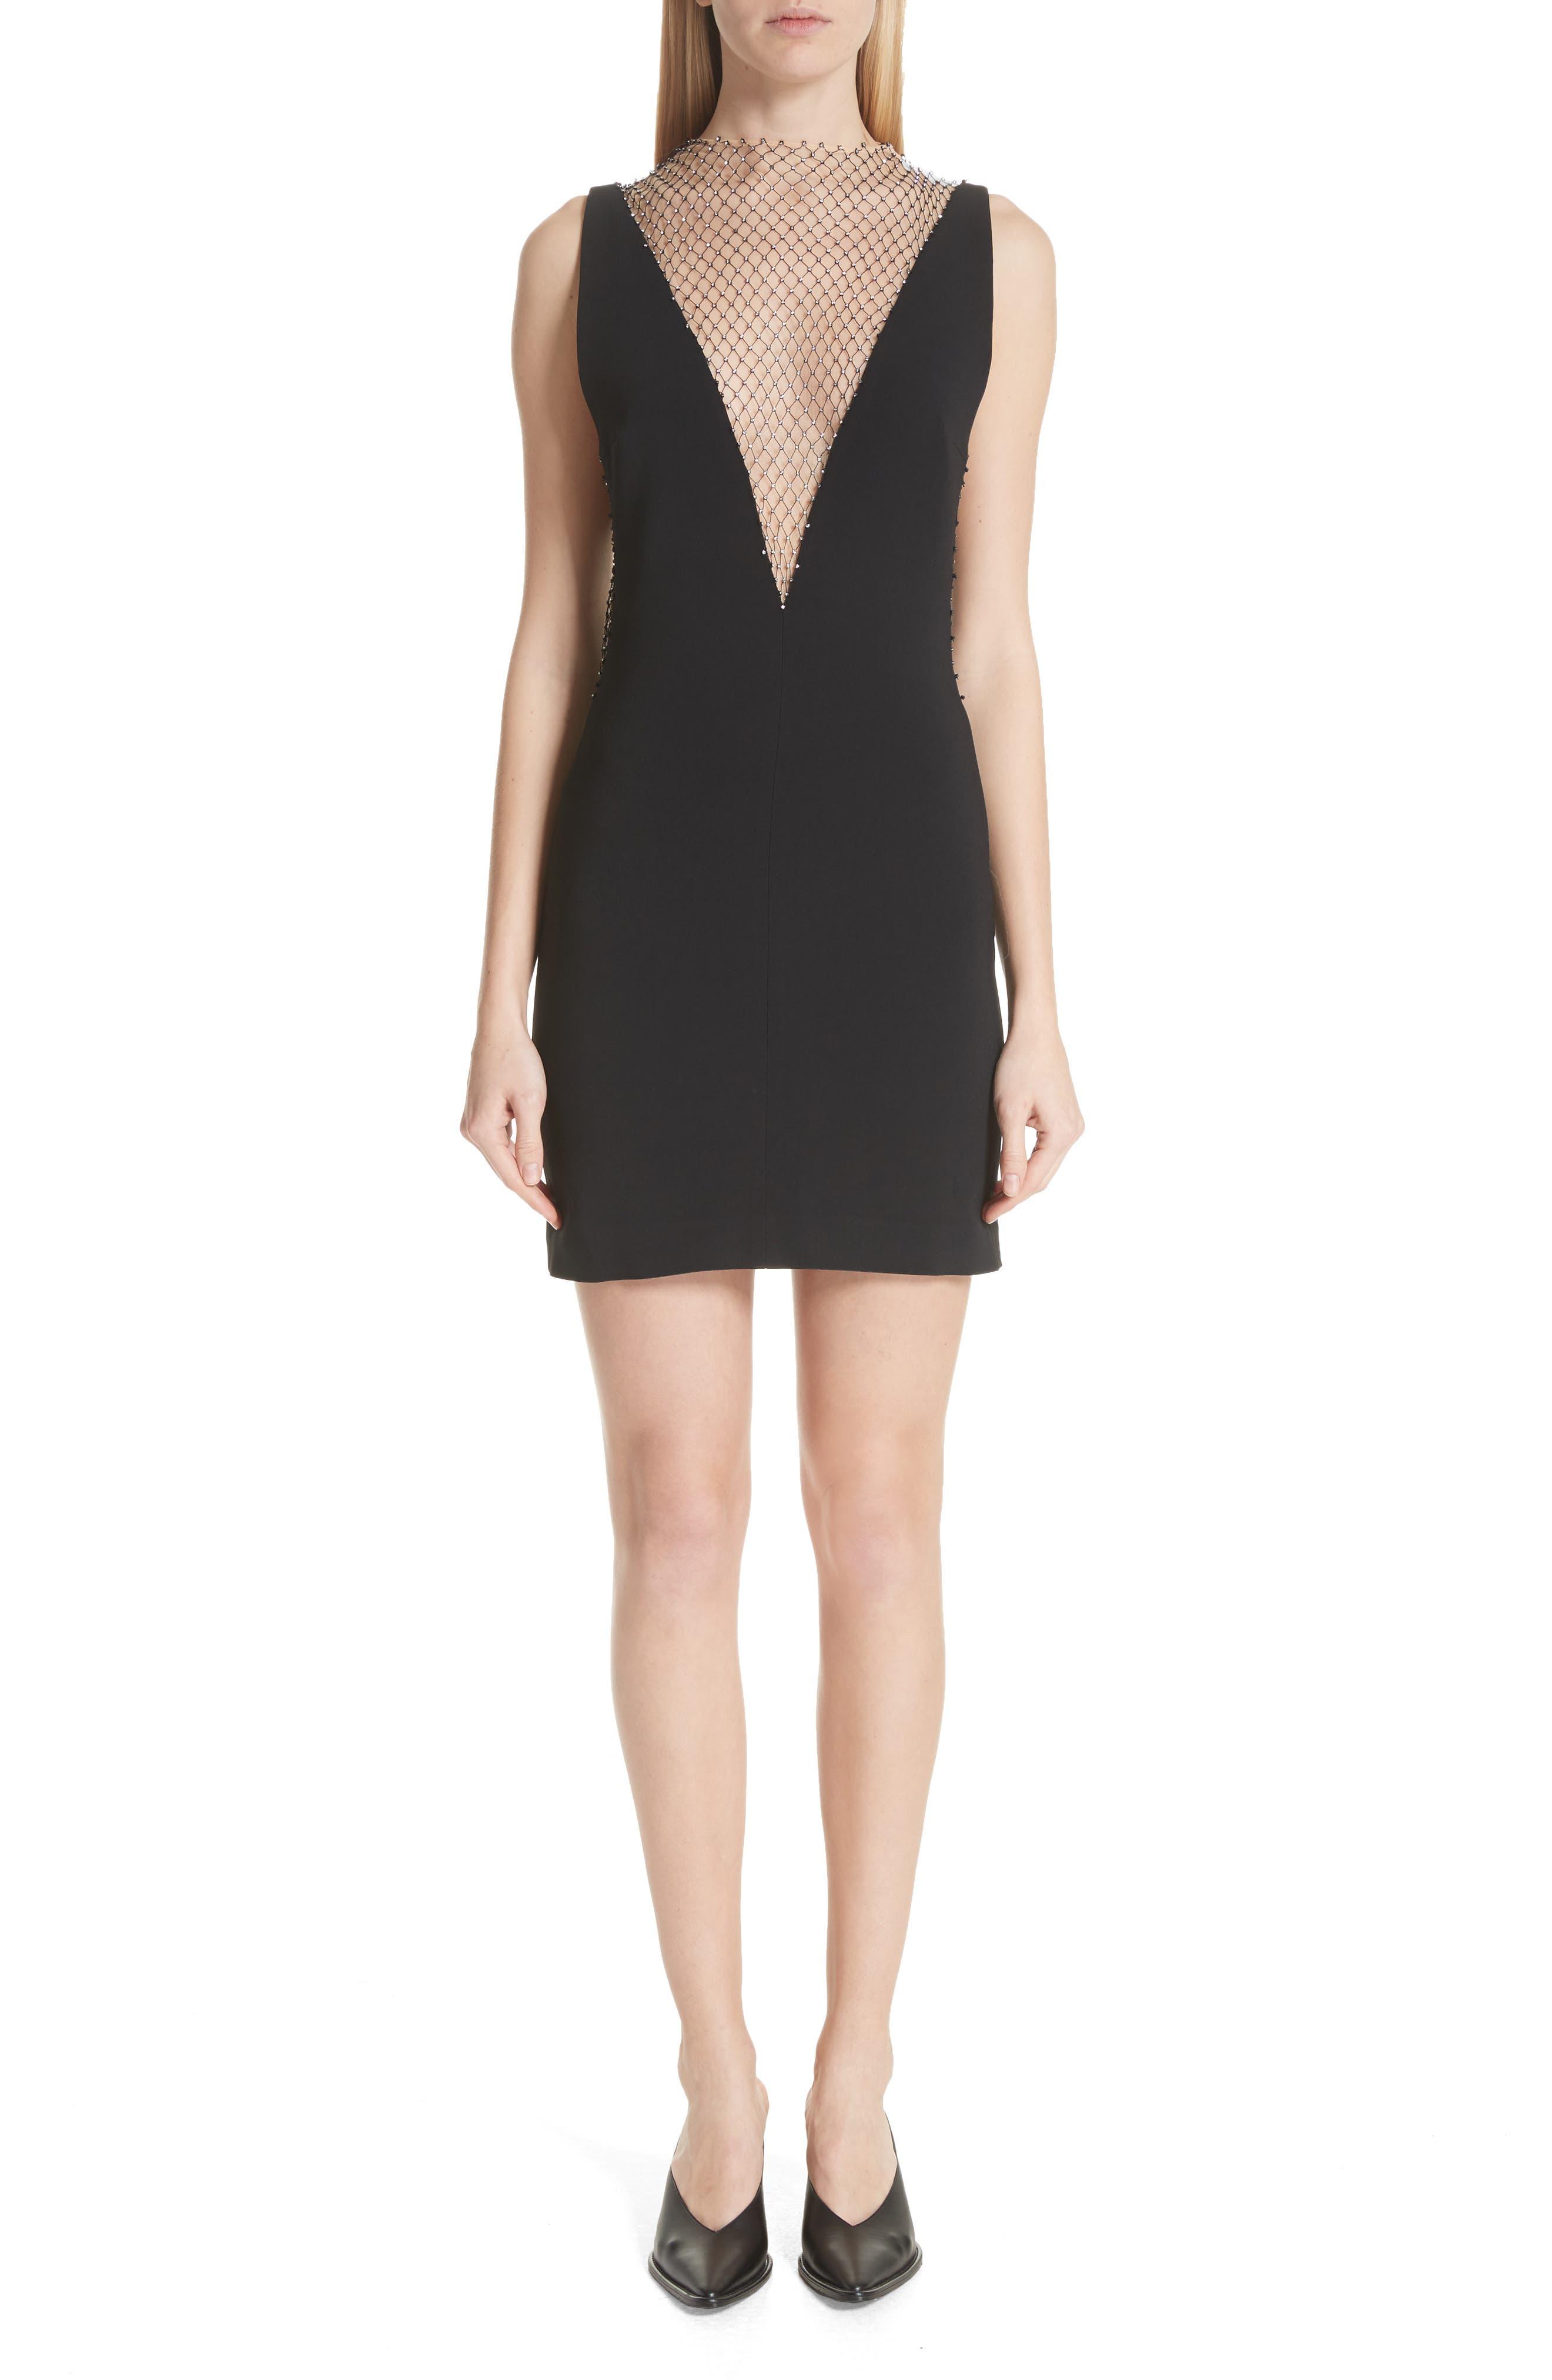 Stella McCartney Mesh & Cady Cocktail Dress